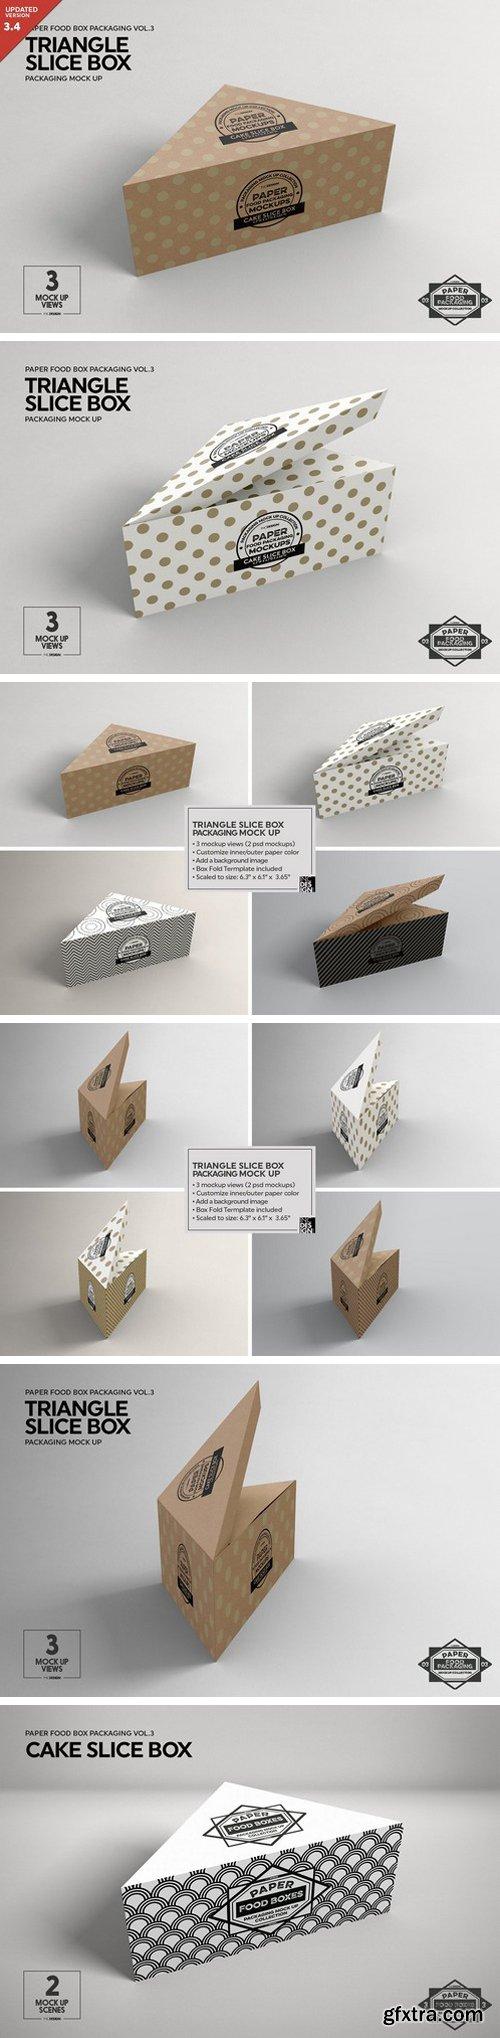 CM - Cake Slice Box Packaging Mockup 1211251